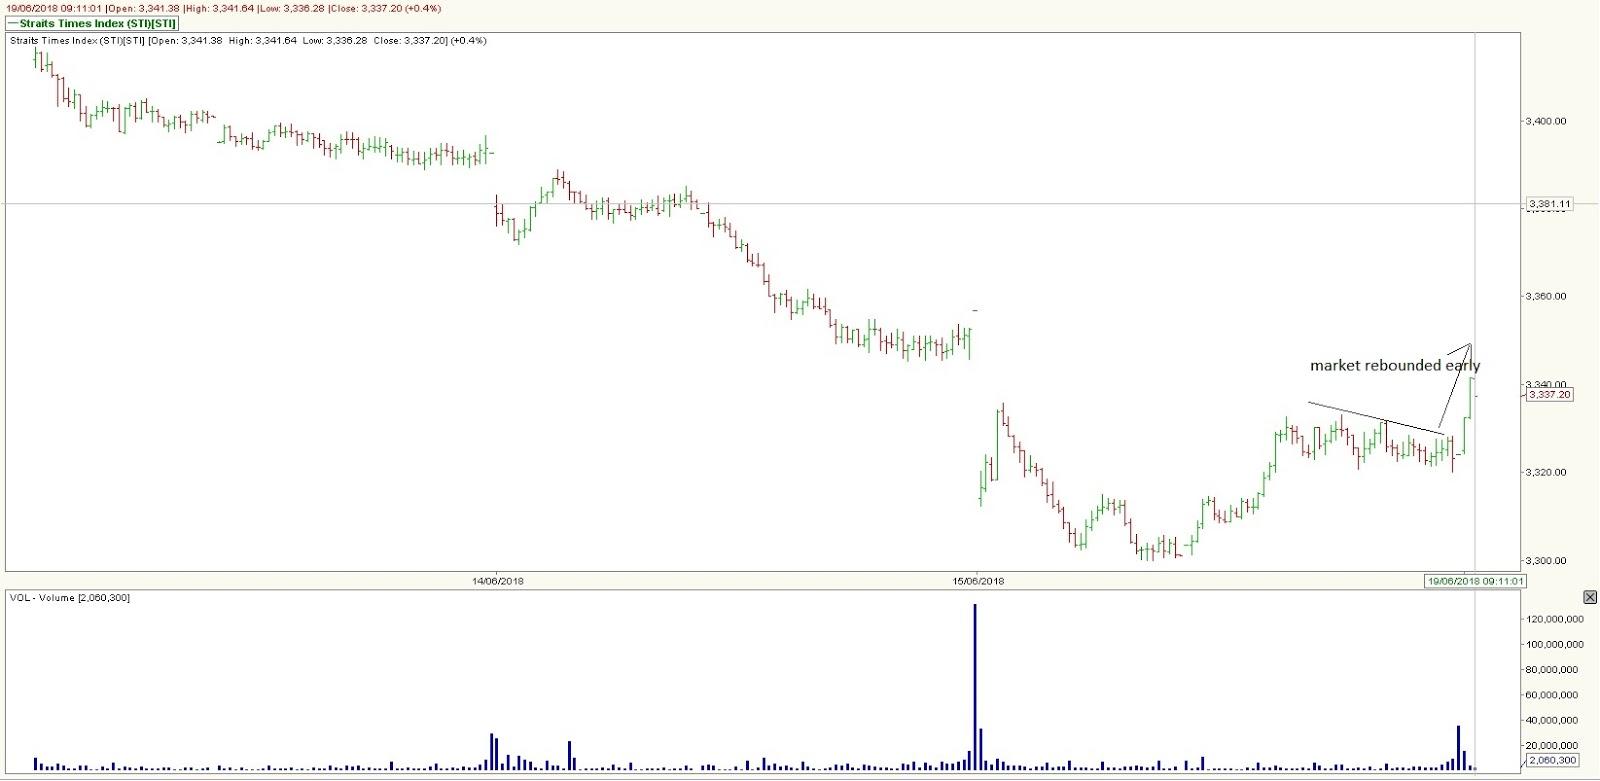 Stock Market Best-Kept Secrets: Singapore Straits Times